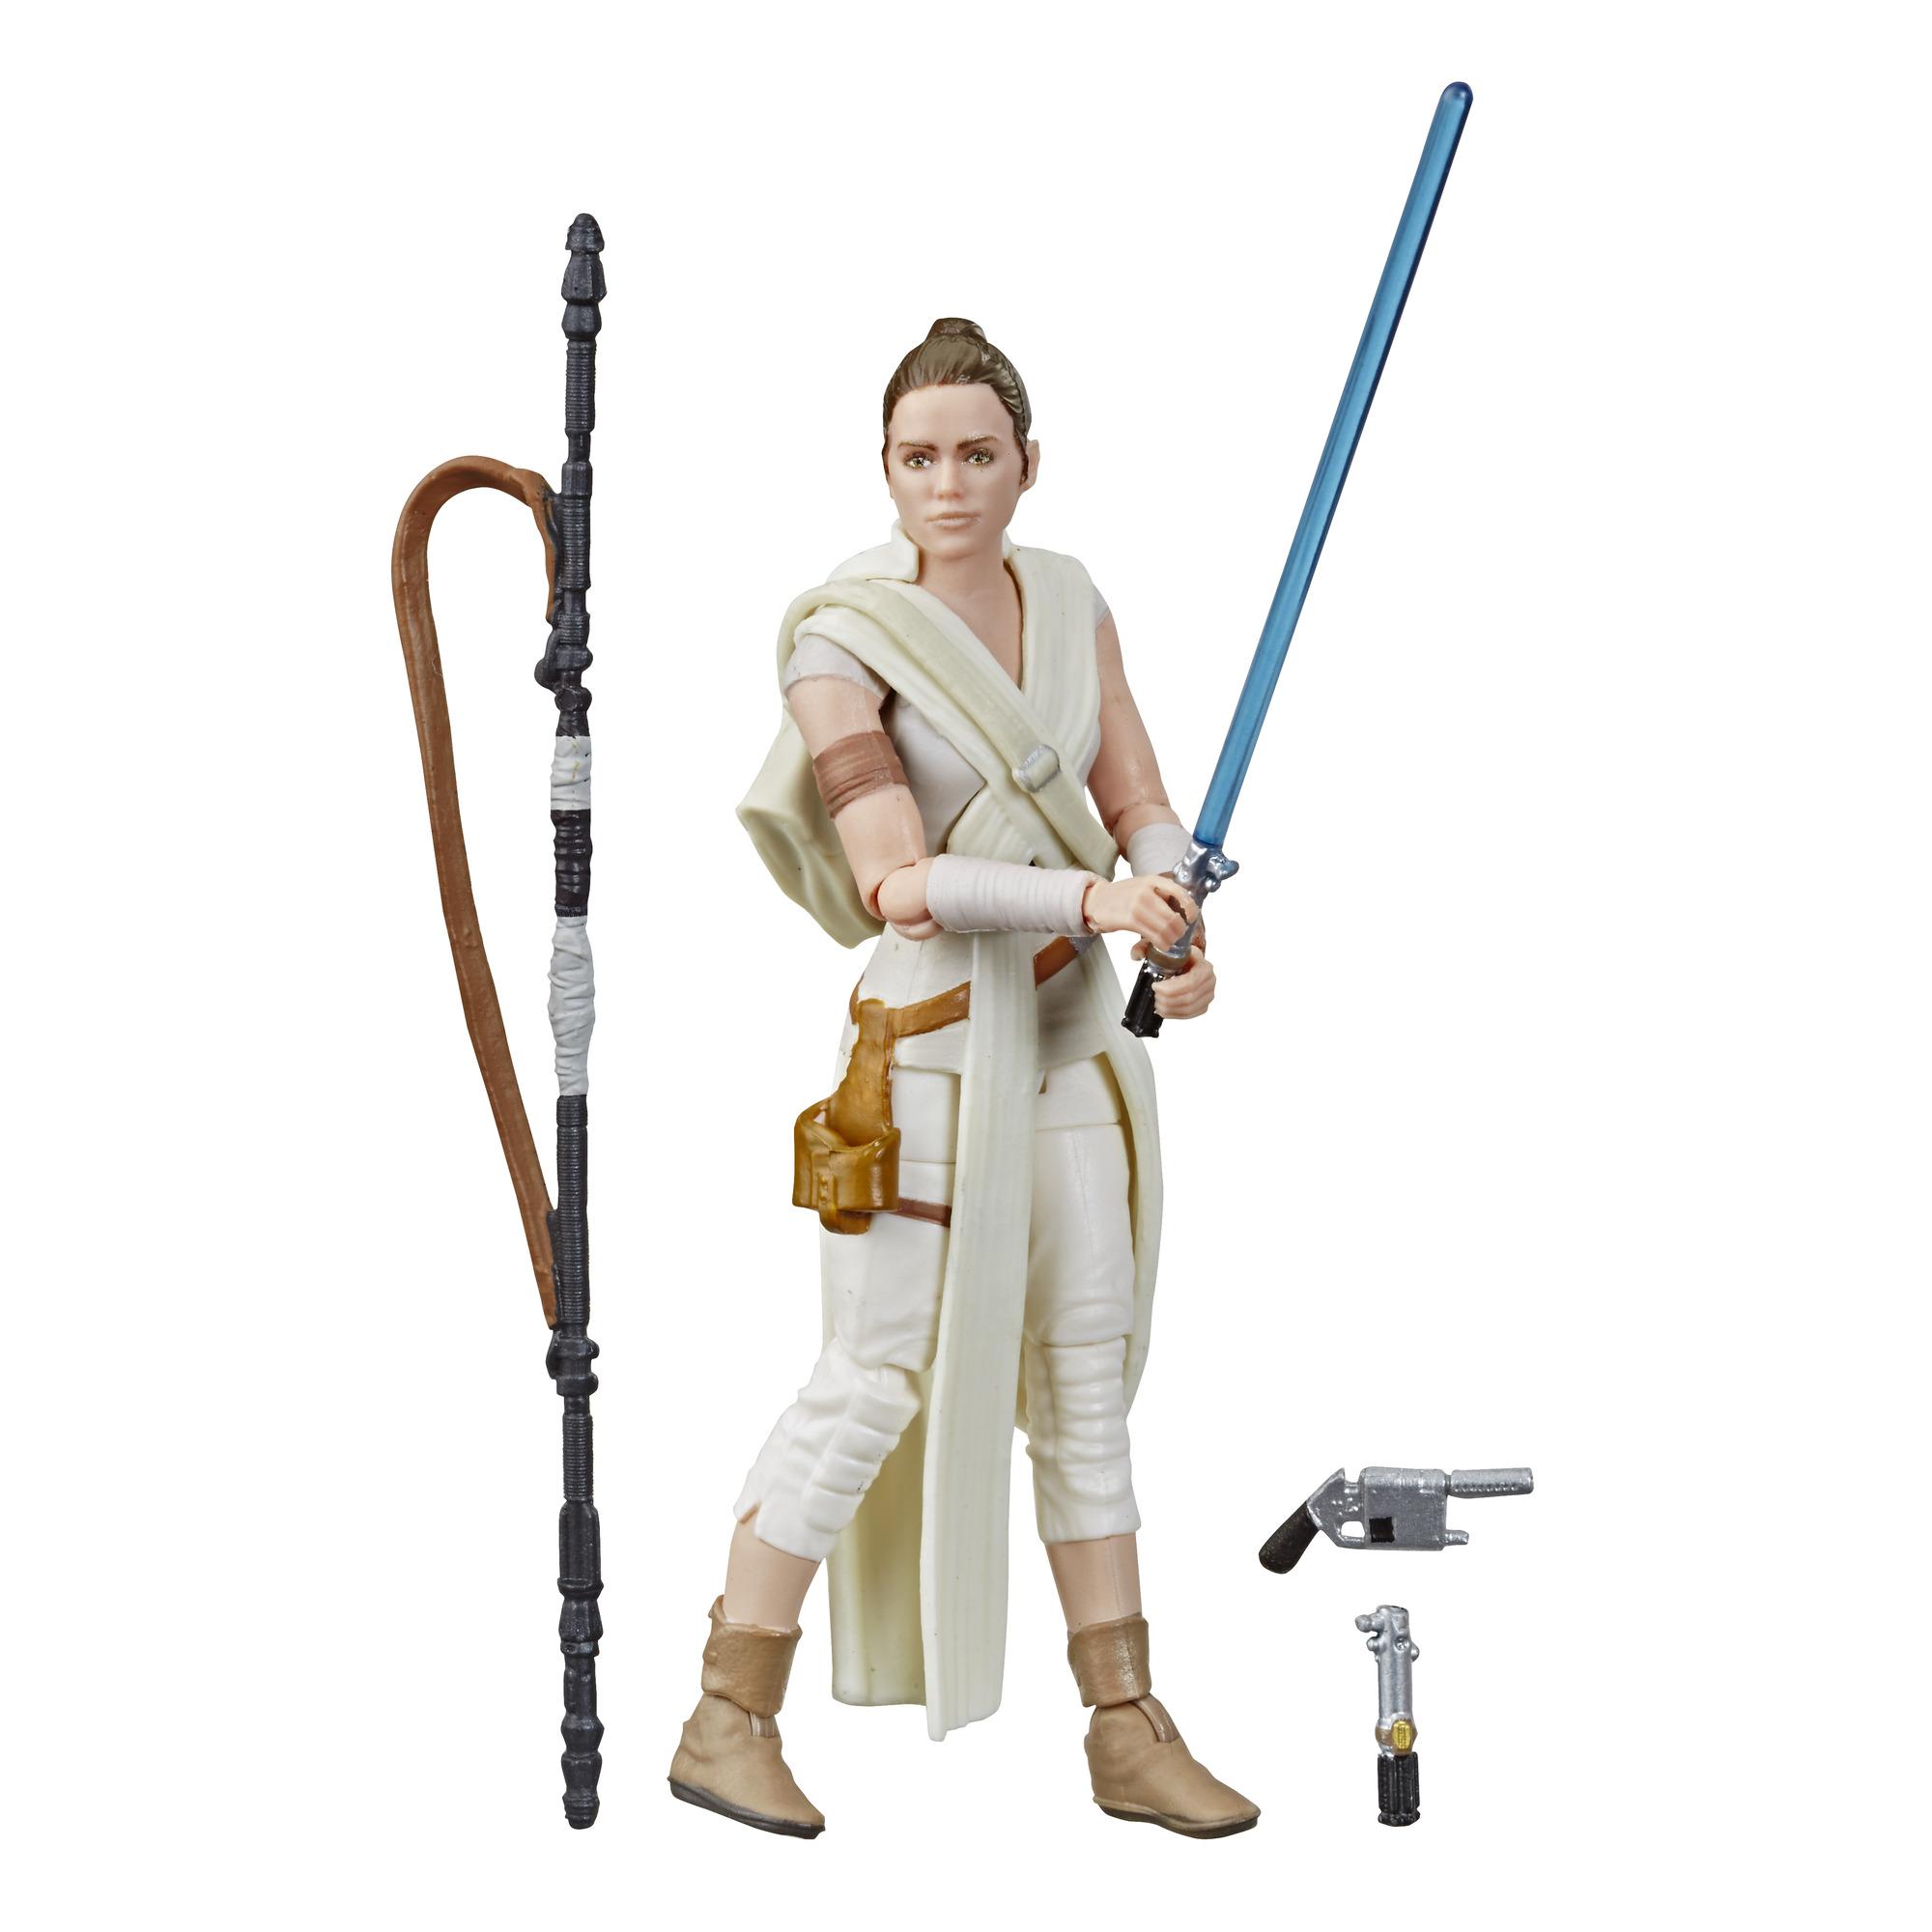 Star Wars The Rise of Skywalker REY Vintage Custom Carded 3.75 Action Figure